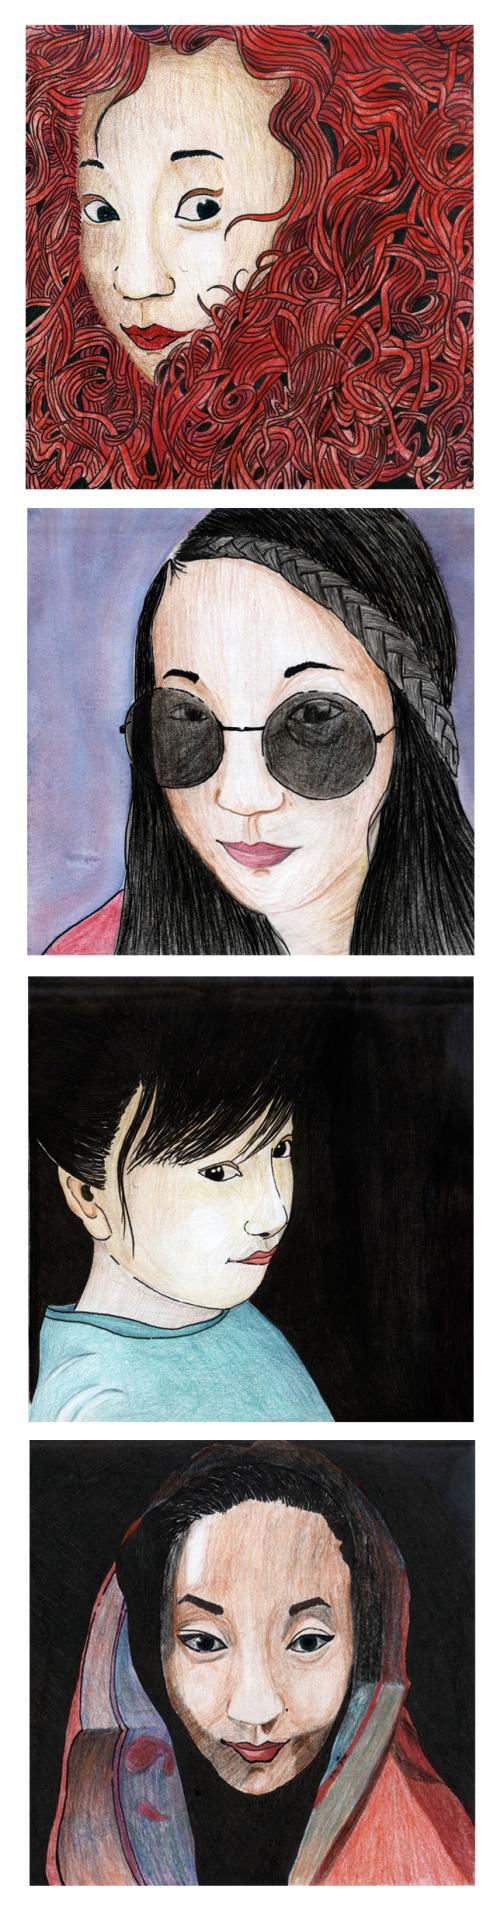 Кунзанг Вангмо (1992-) - художница из Бутана.